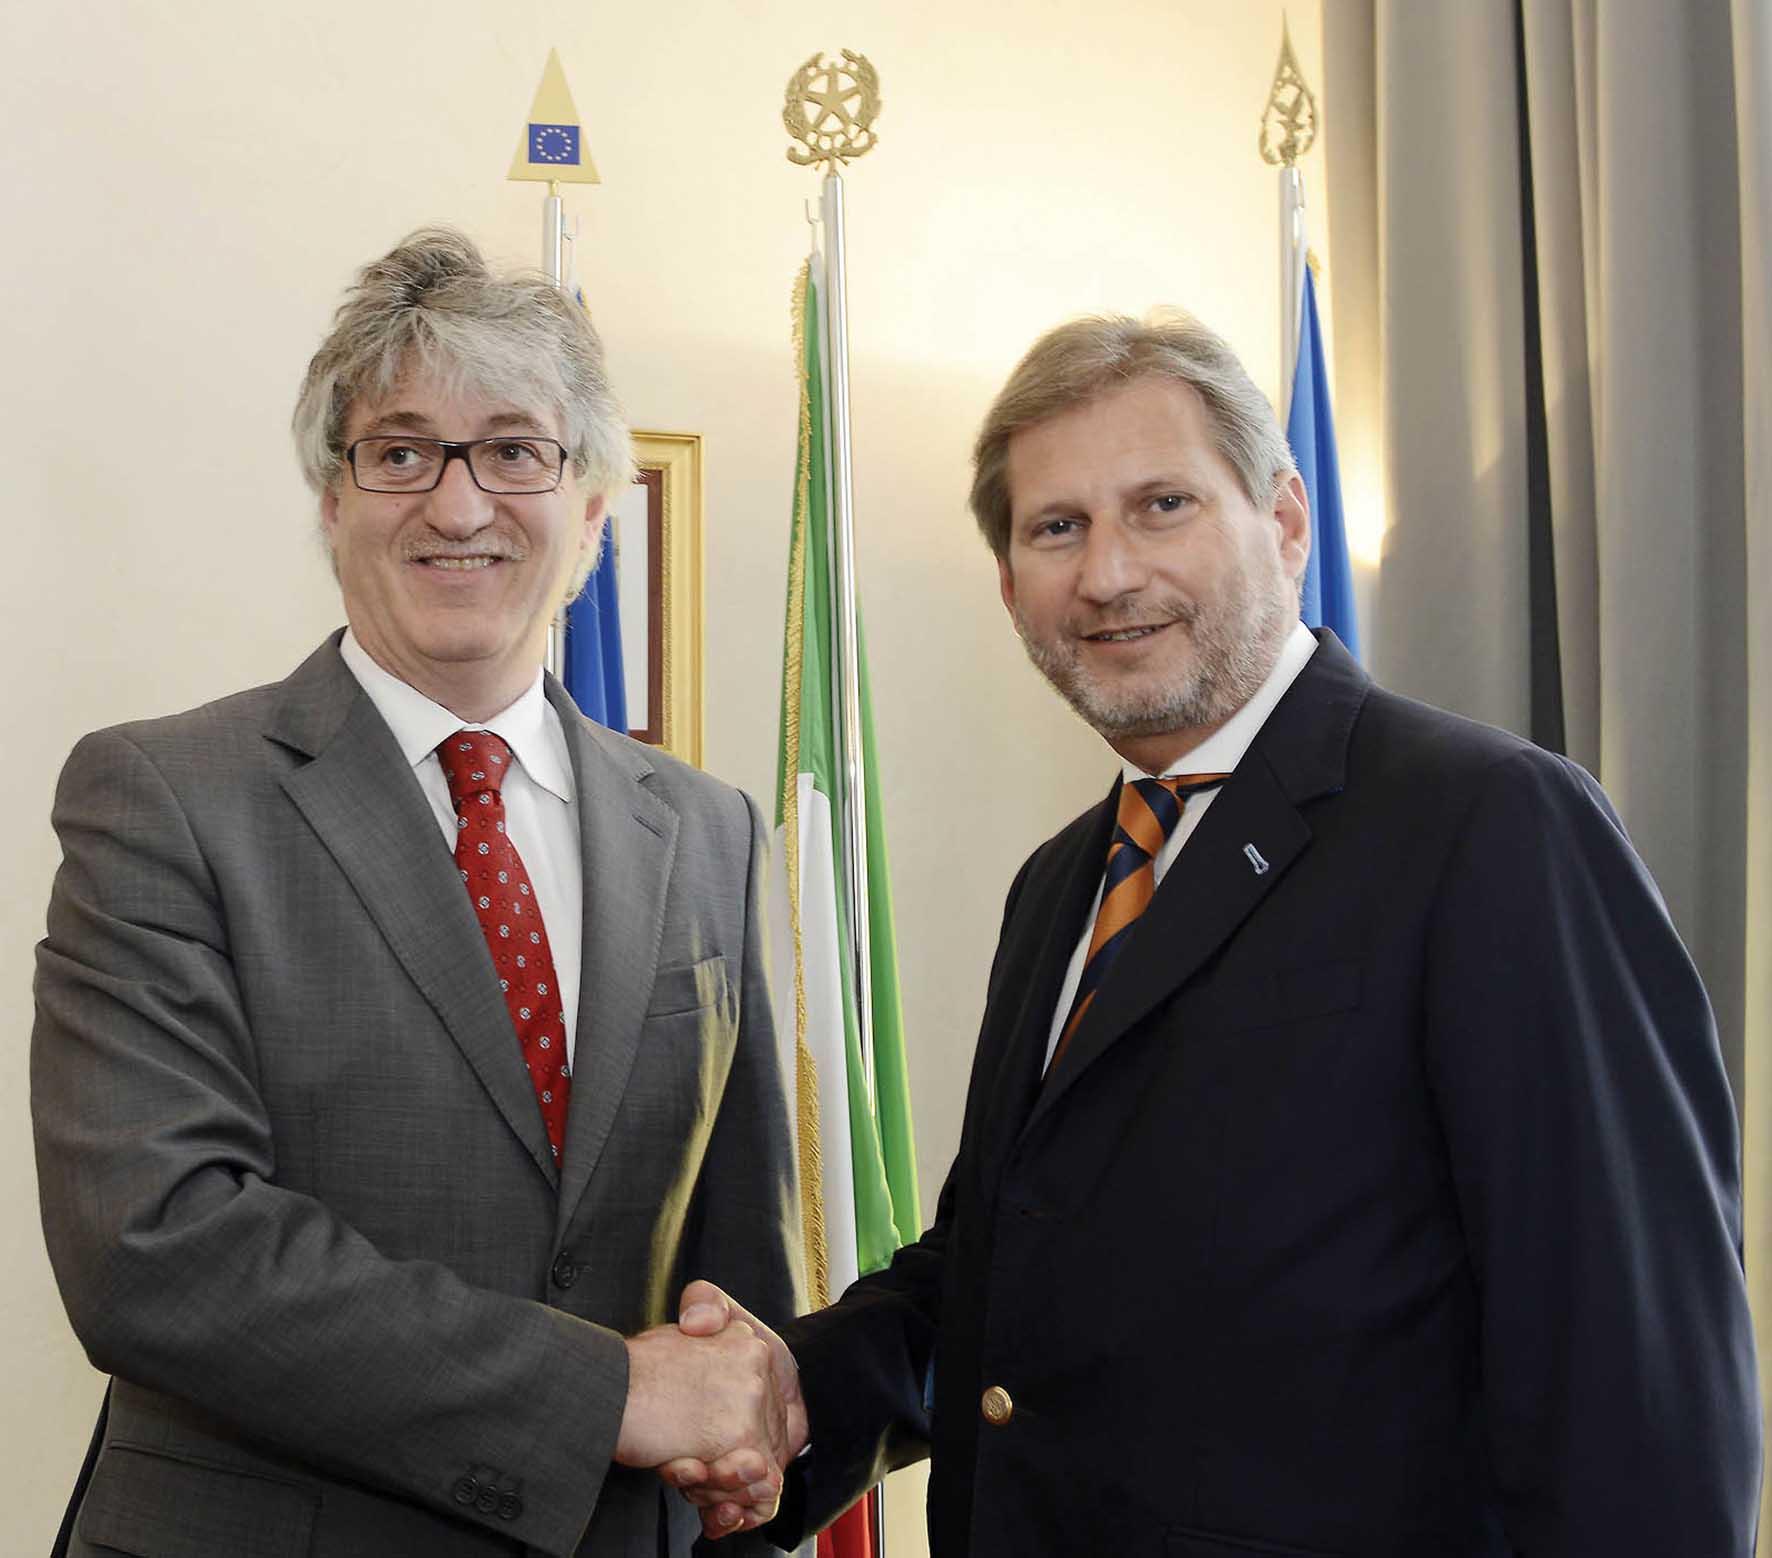 FVG Renzo Tondo commissario UE politiche europee Johannes Hahn 1